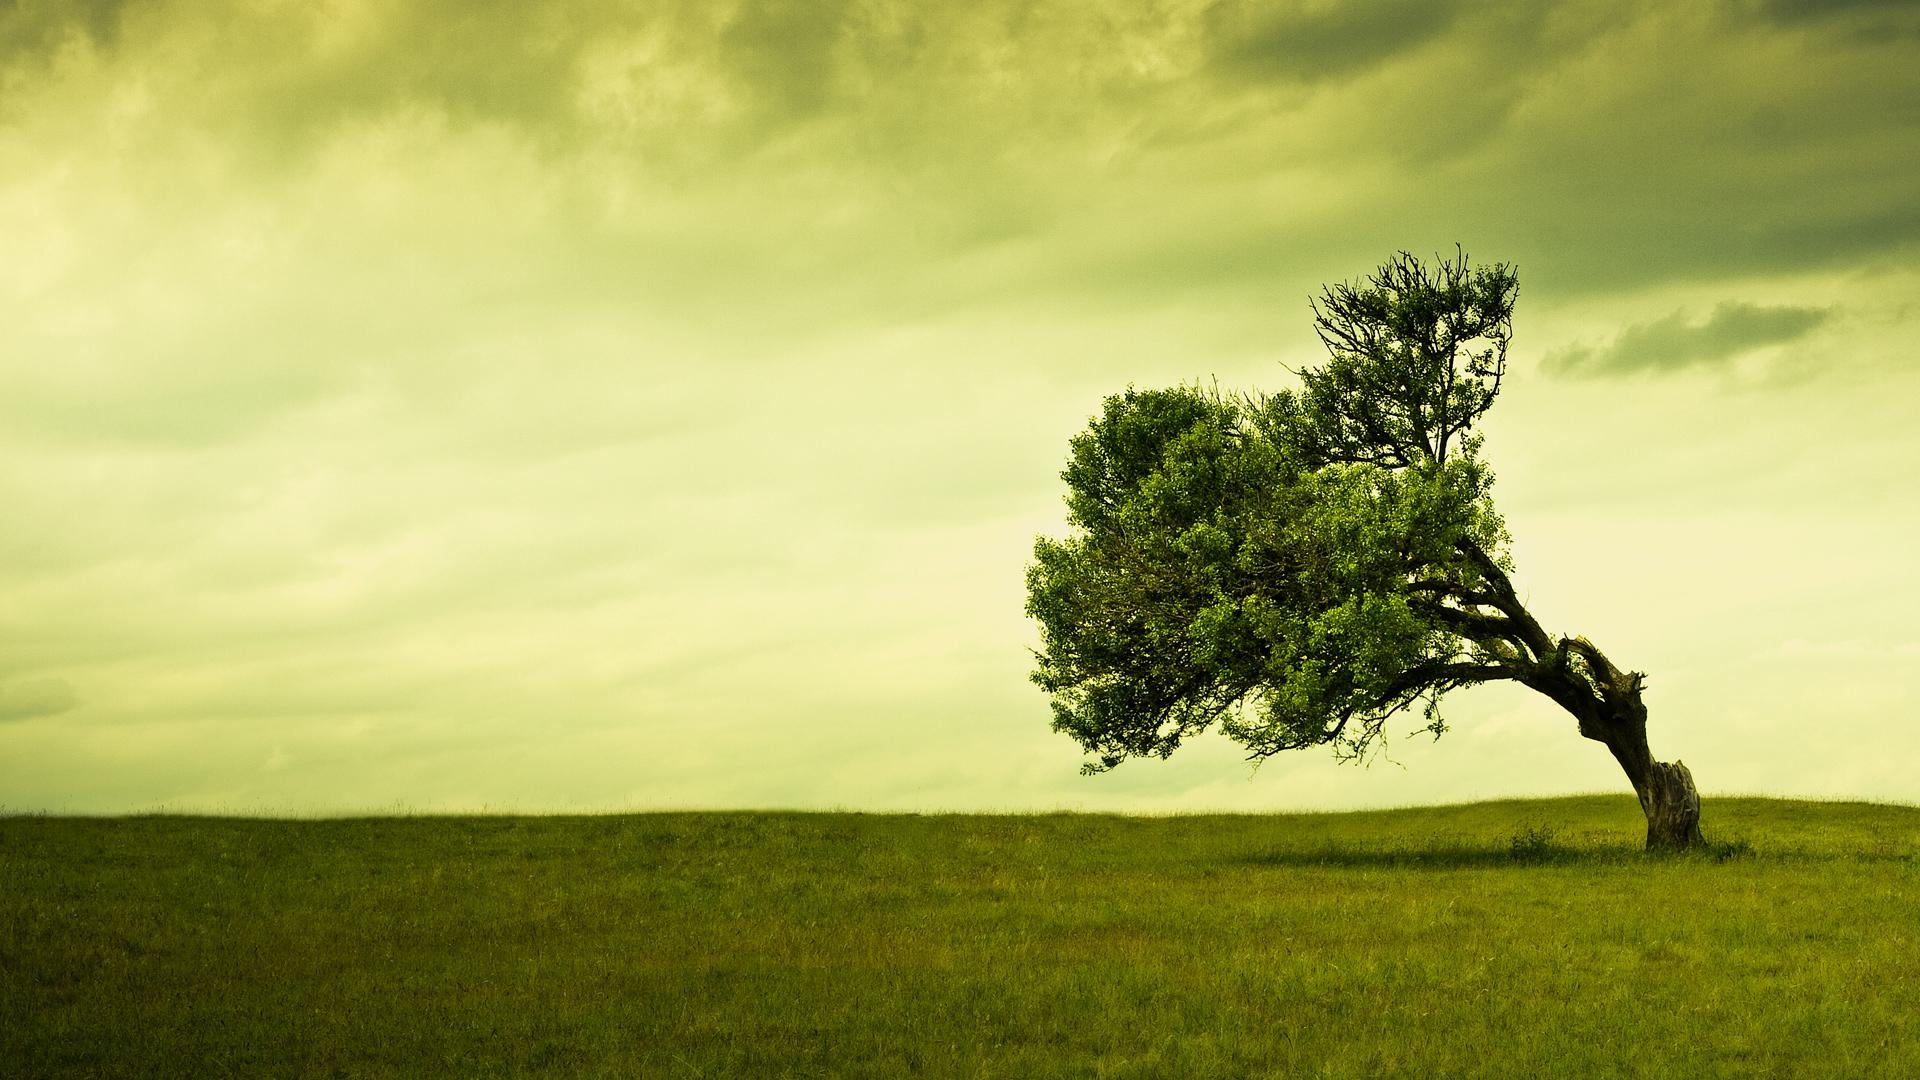 Free Tree Wallpaper